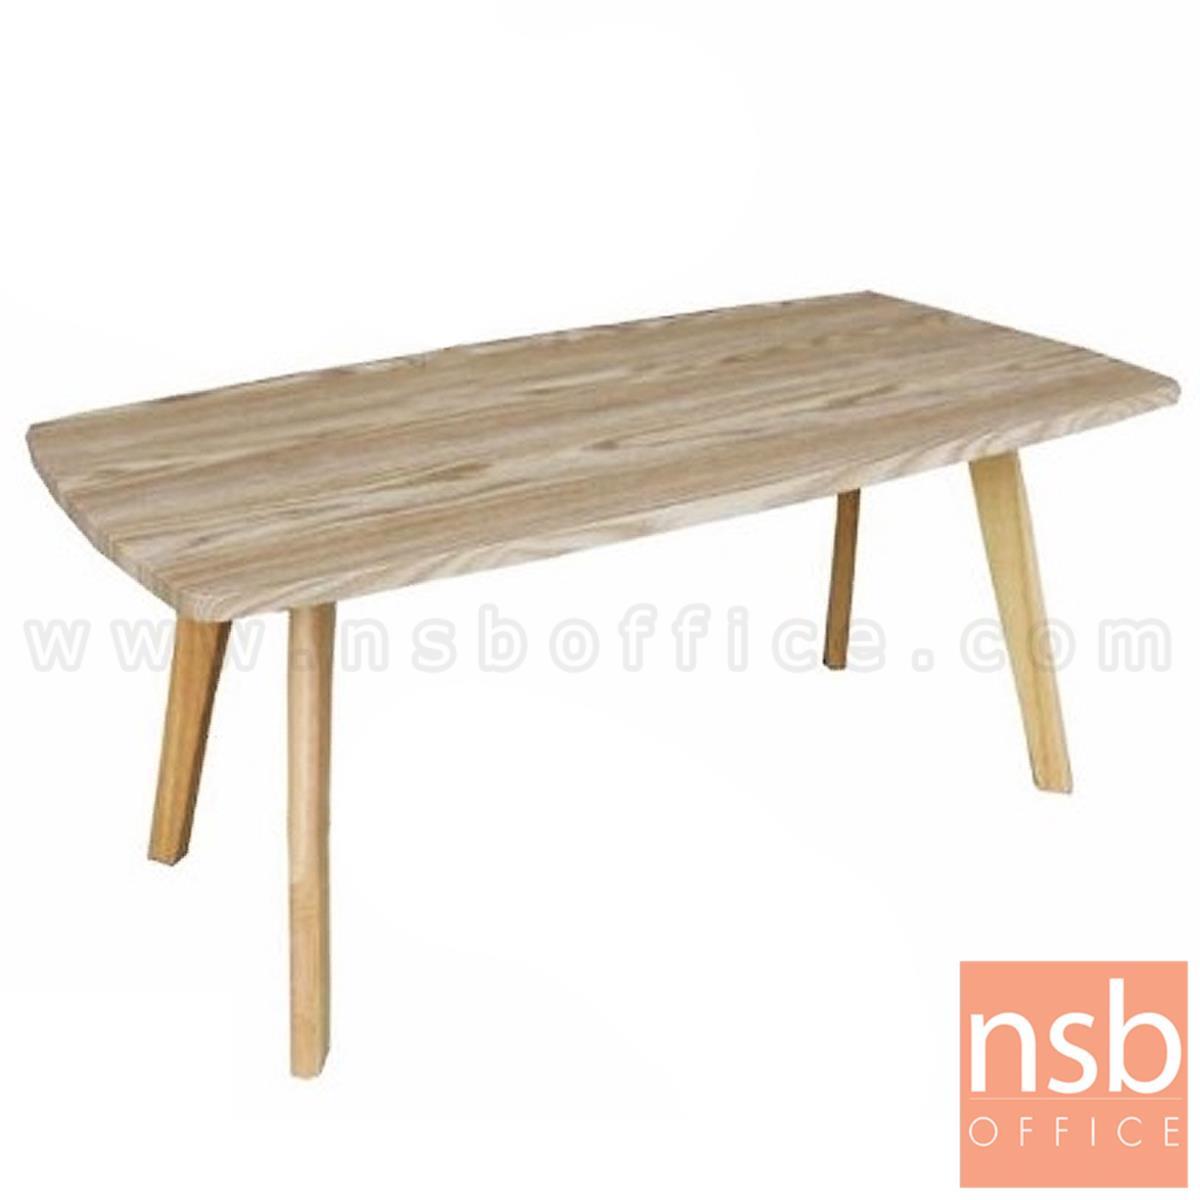 B13A287:โต๊ะกลางไม้ รุ่น Angvish (แองวิช) ขนาด 100W cm. ขาไม้